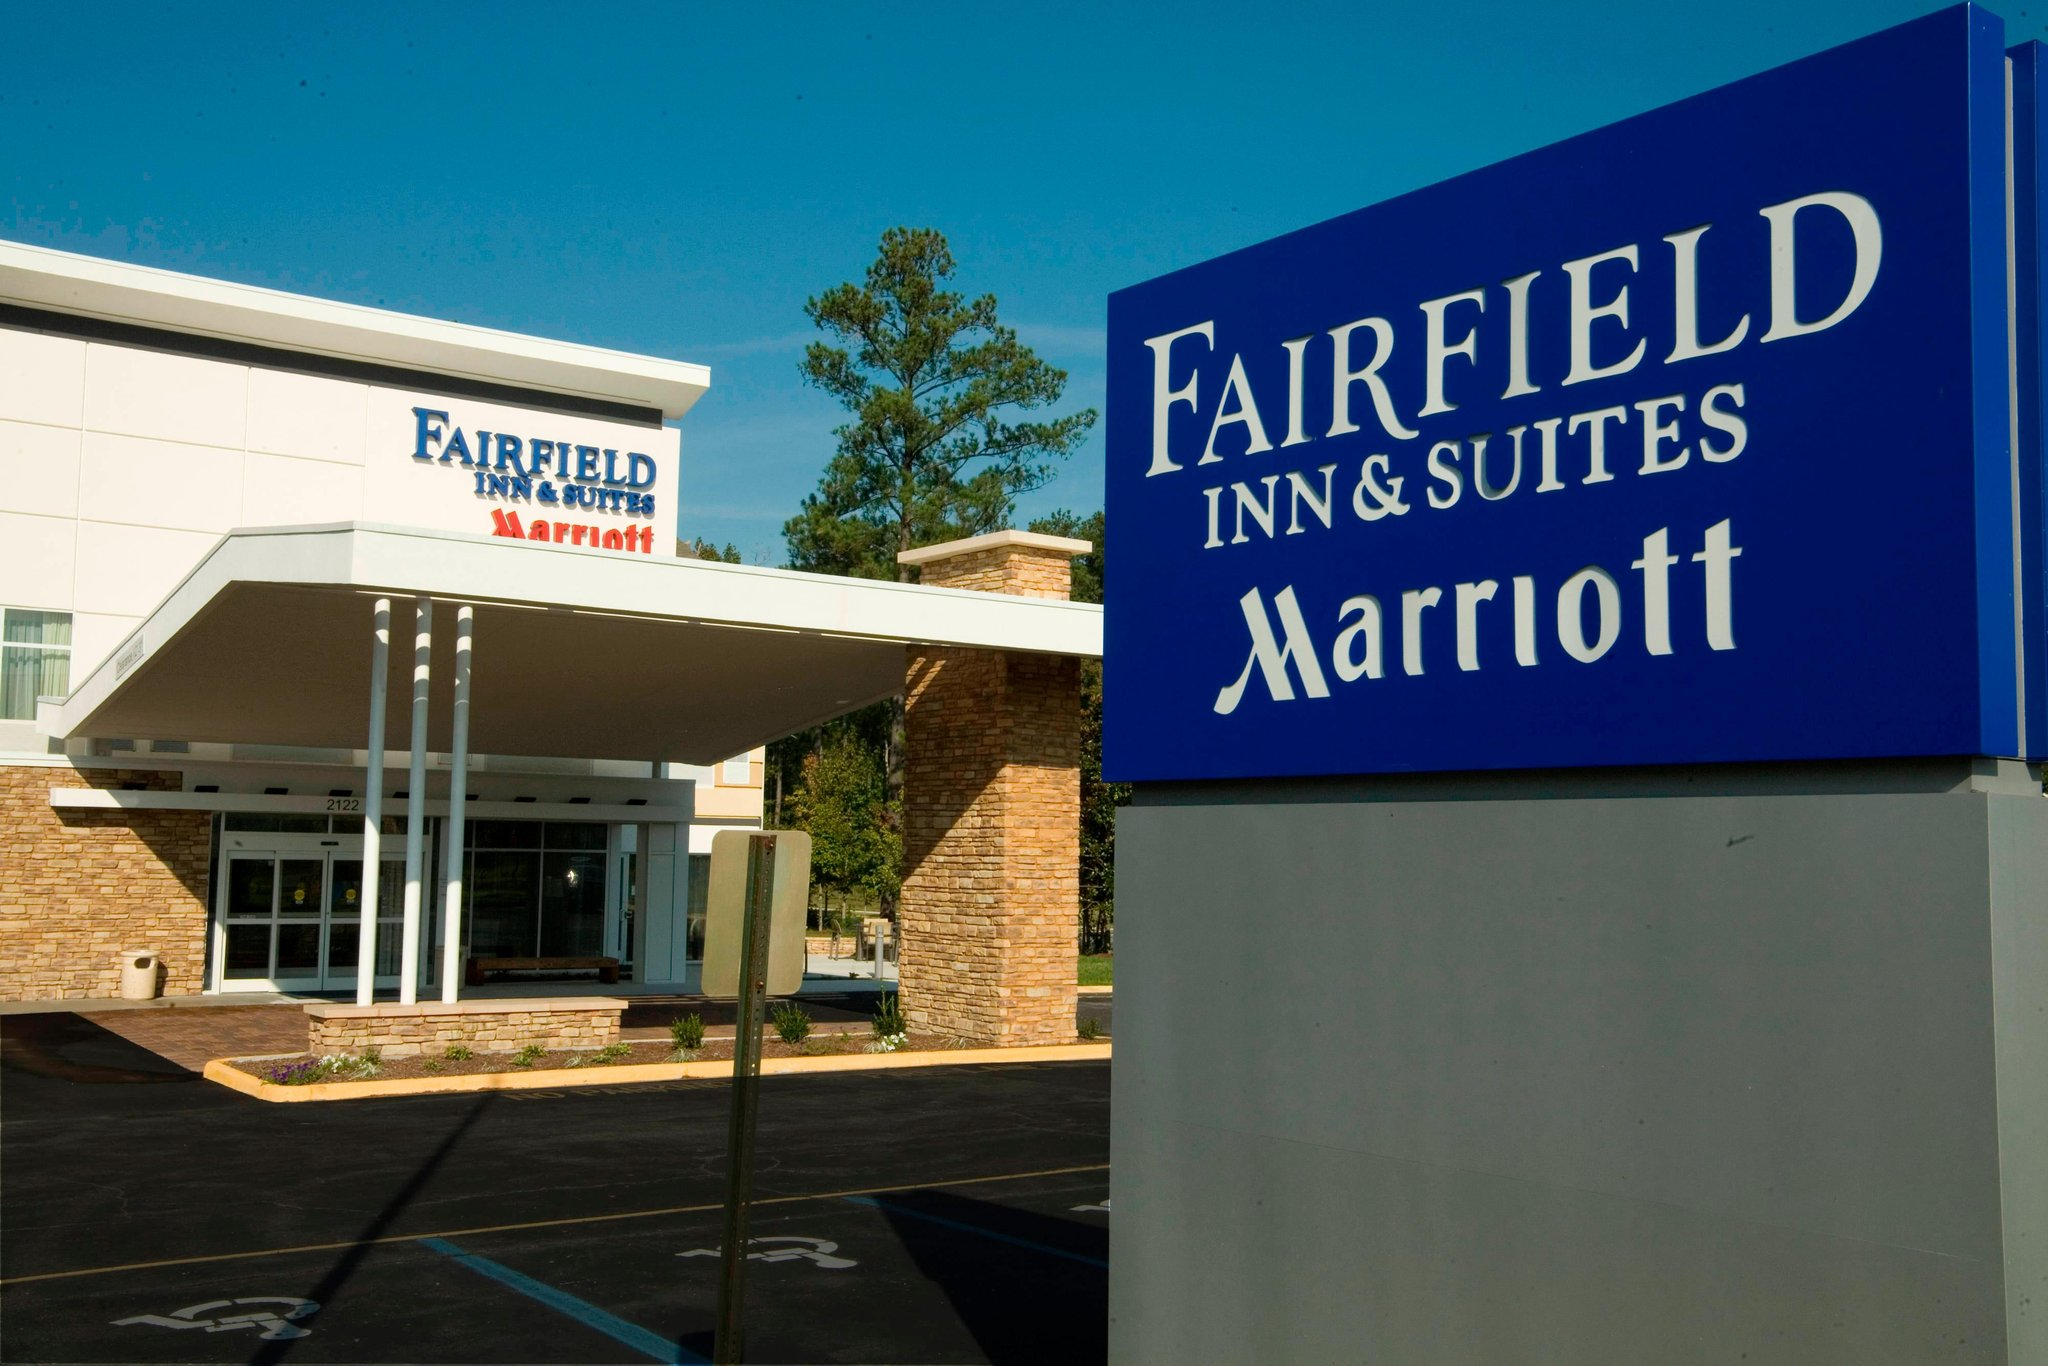 Fairfield Inn and Suites by Marriott Chesapeake Suffolk